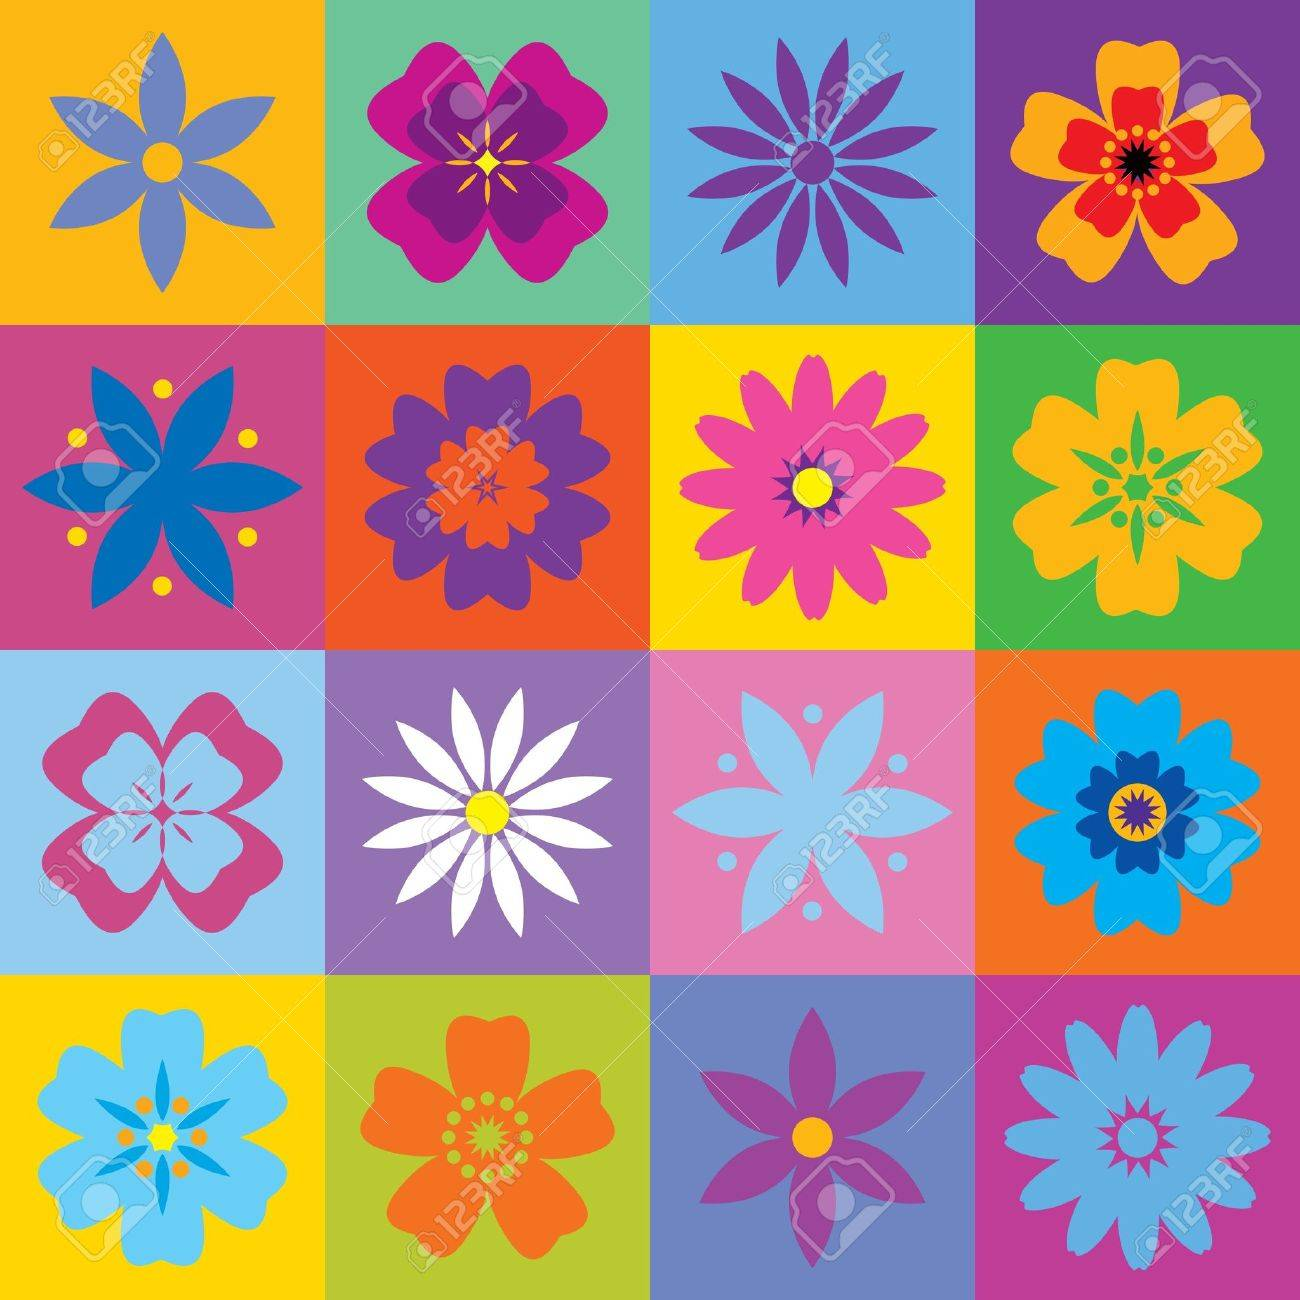 18 675 poppy flower stock vector illustration and royalty free